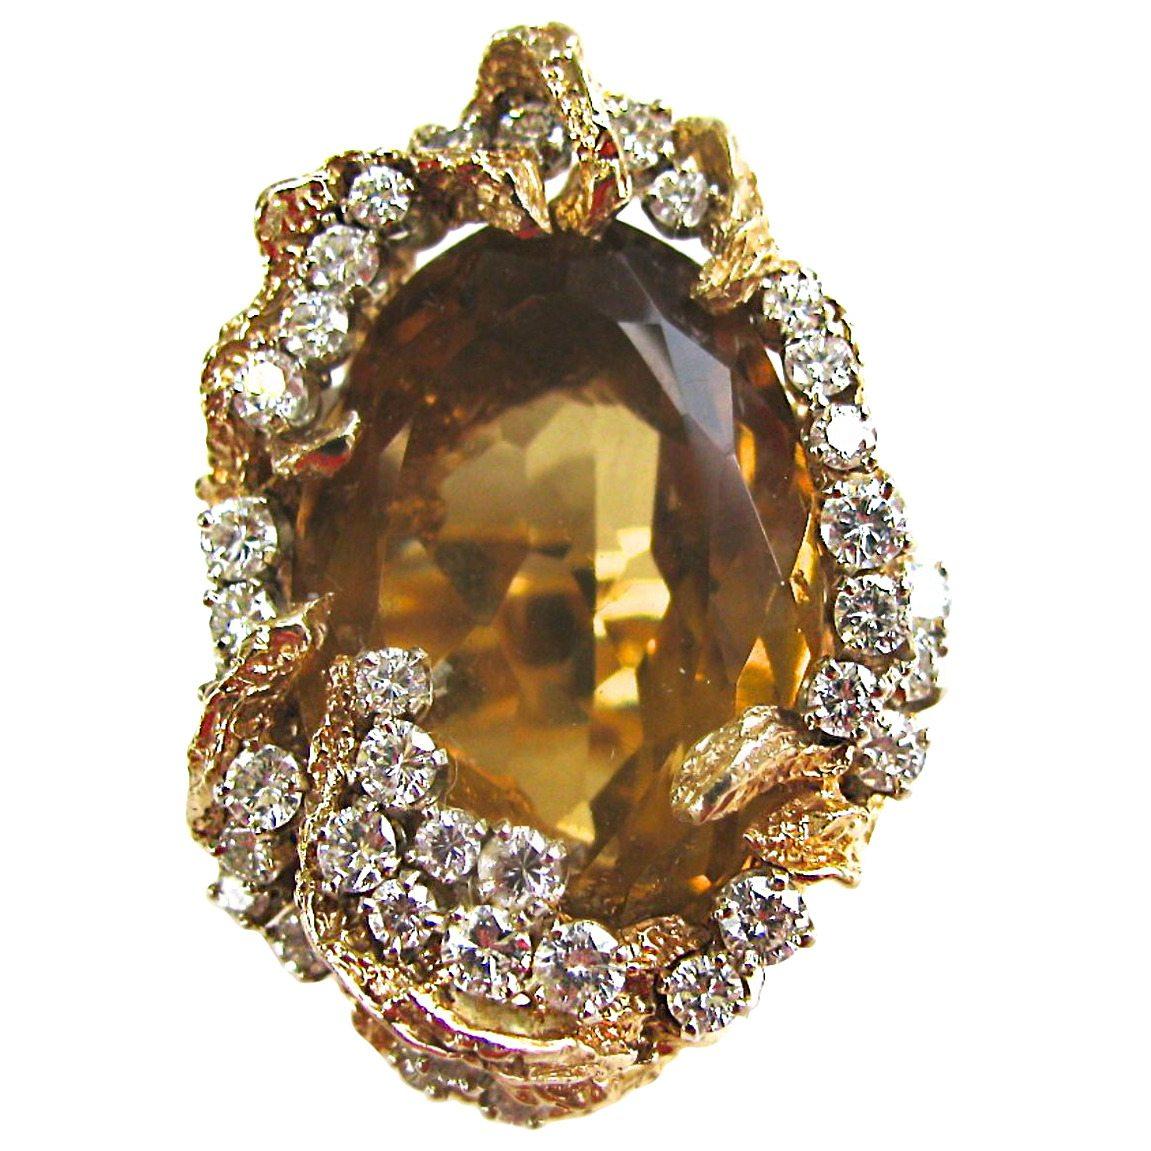 Ring, Verenigde Staten, circa 1960. Foto Kimberly Klosterman, beryl, goud, diamant